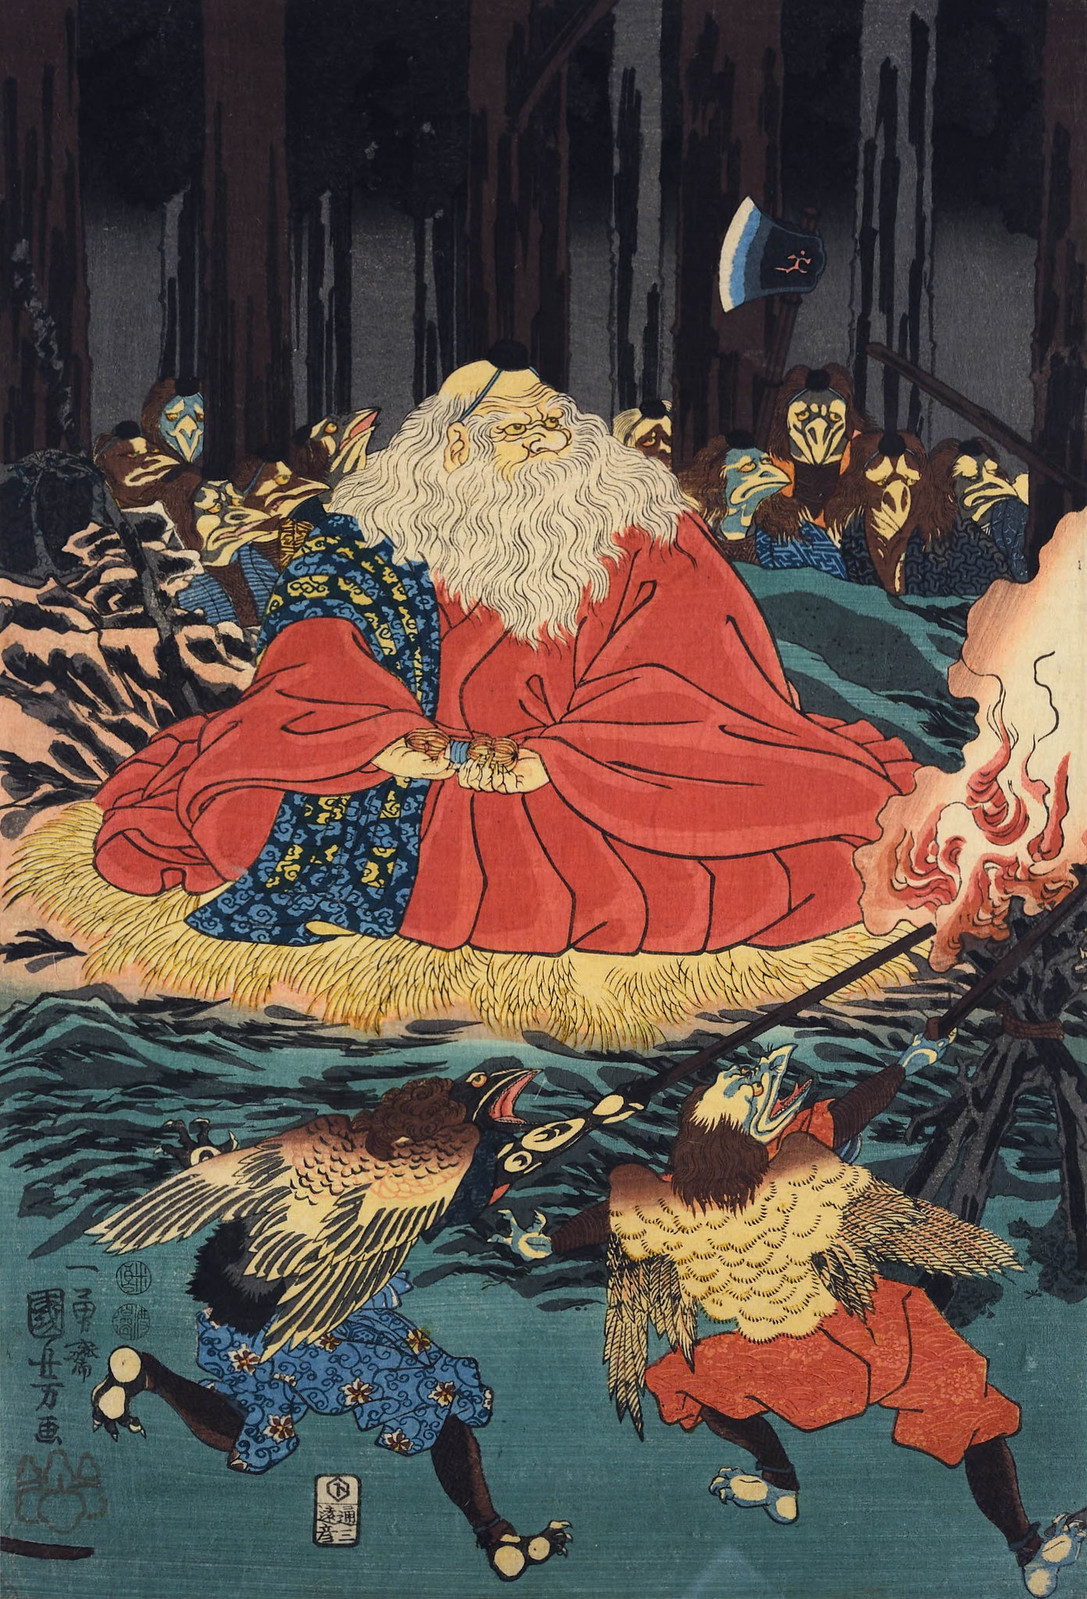 Utagawa Kuniyoshi - Sojobo, King of the Tengu, and Yoshitsune leaping in the air, 1847-52 (middle panel)